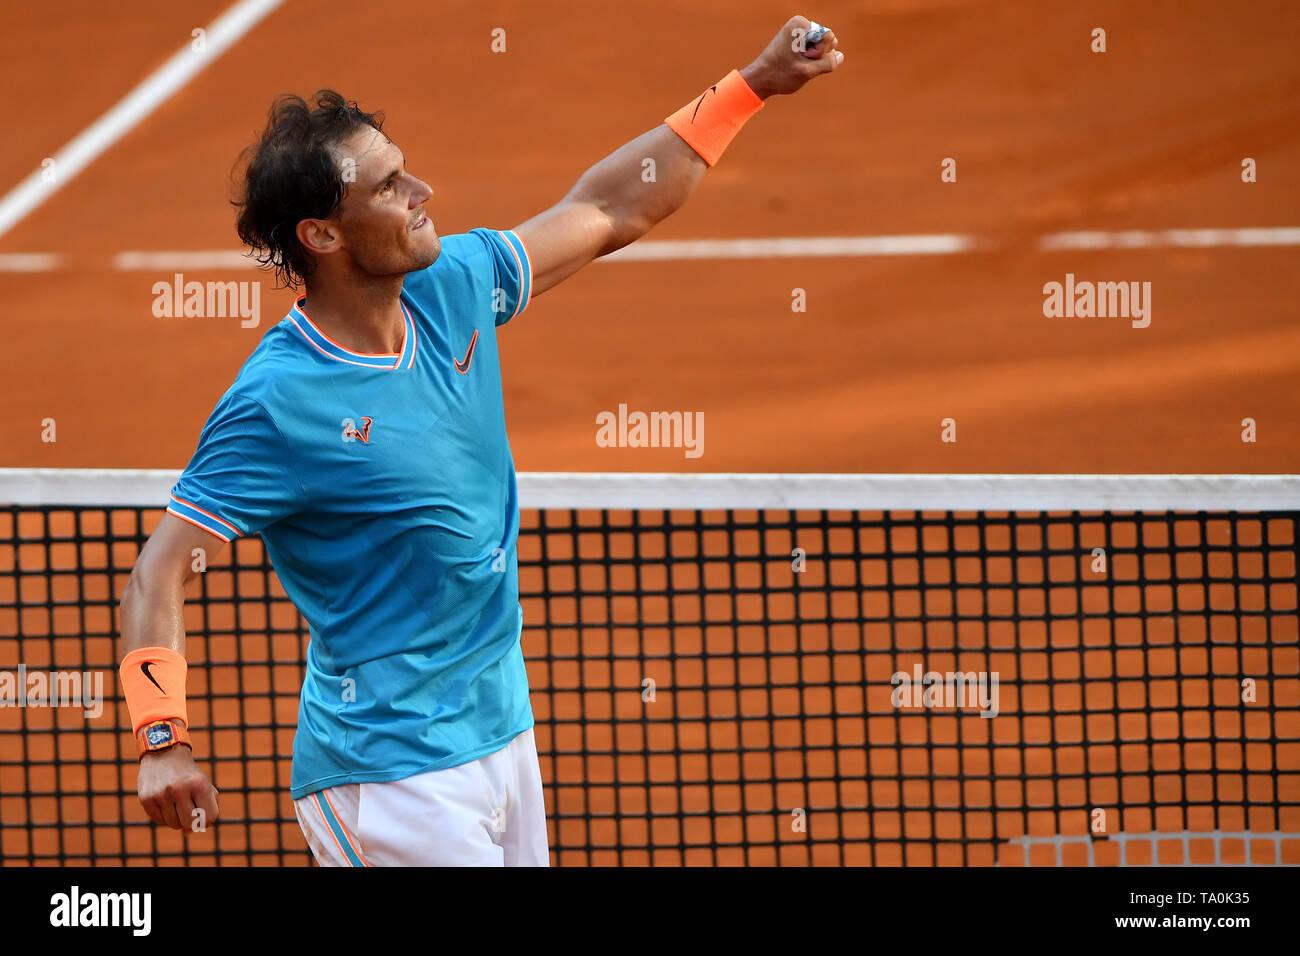 Rafael Nadal of Spain celebrates after winning the men's final match against Novak Djokovic of Serbia. Rafael Nadal won 6-0, 4-6, 6-1  Roma 19/05/2019 - Stock Image